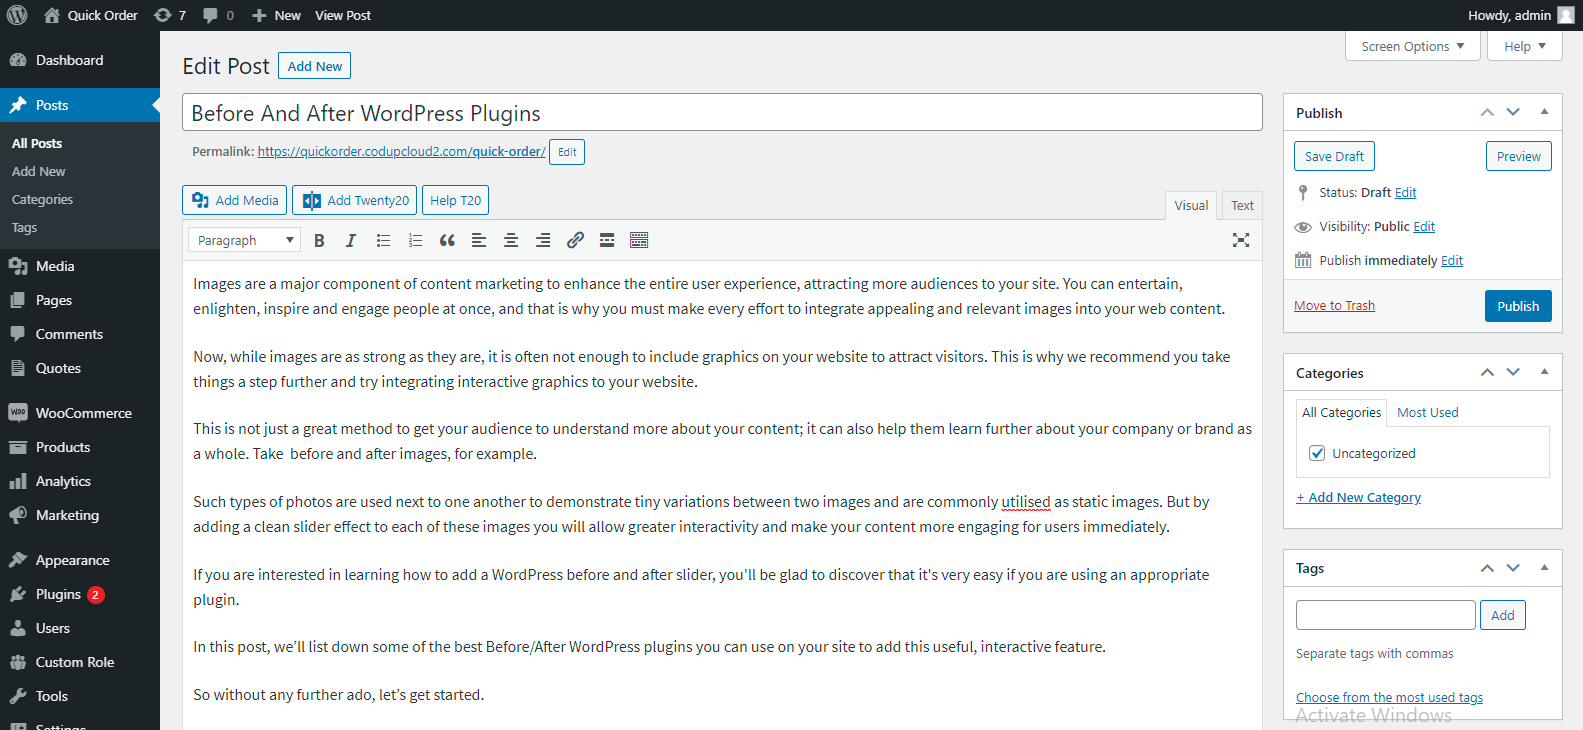 Before and After WordPress plugin setup